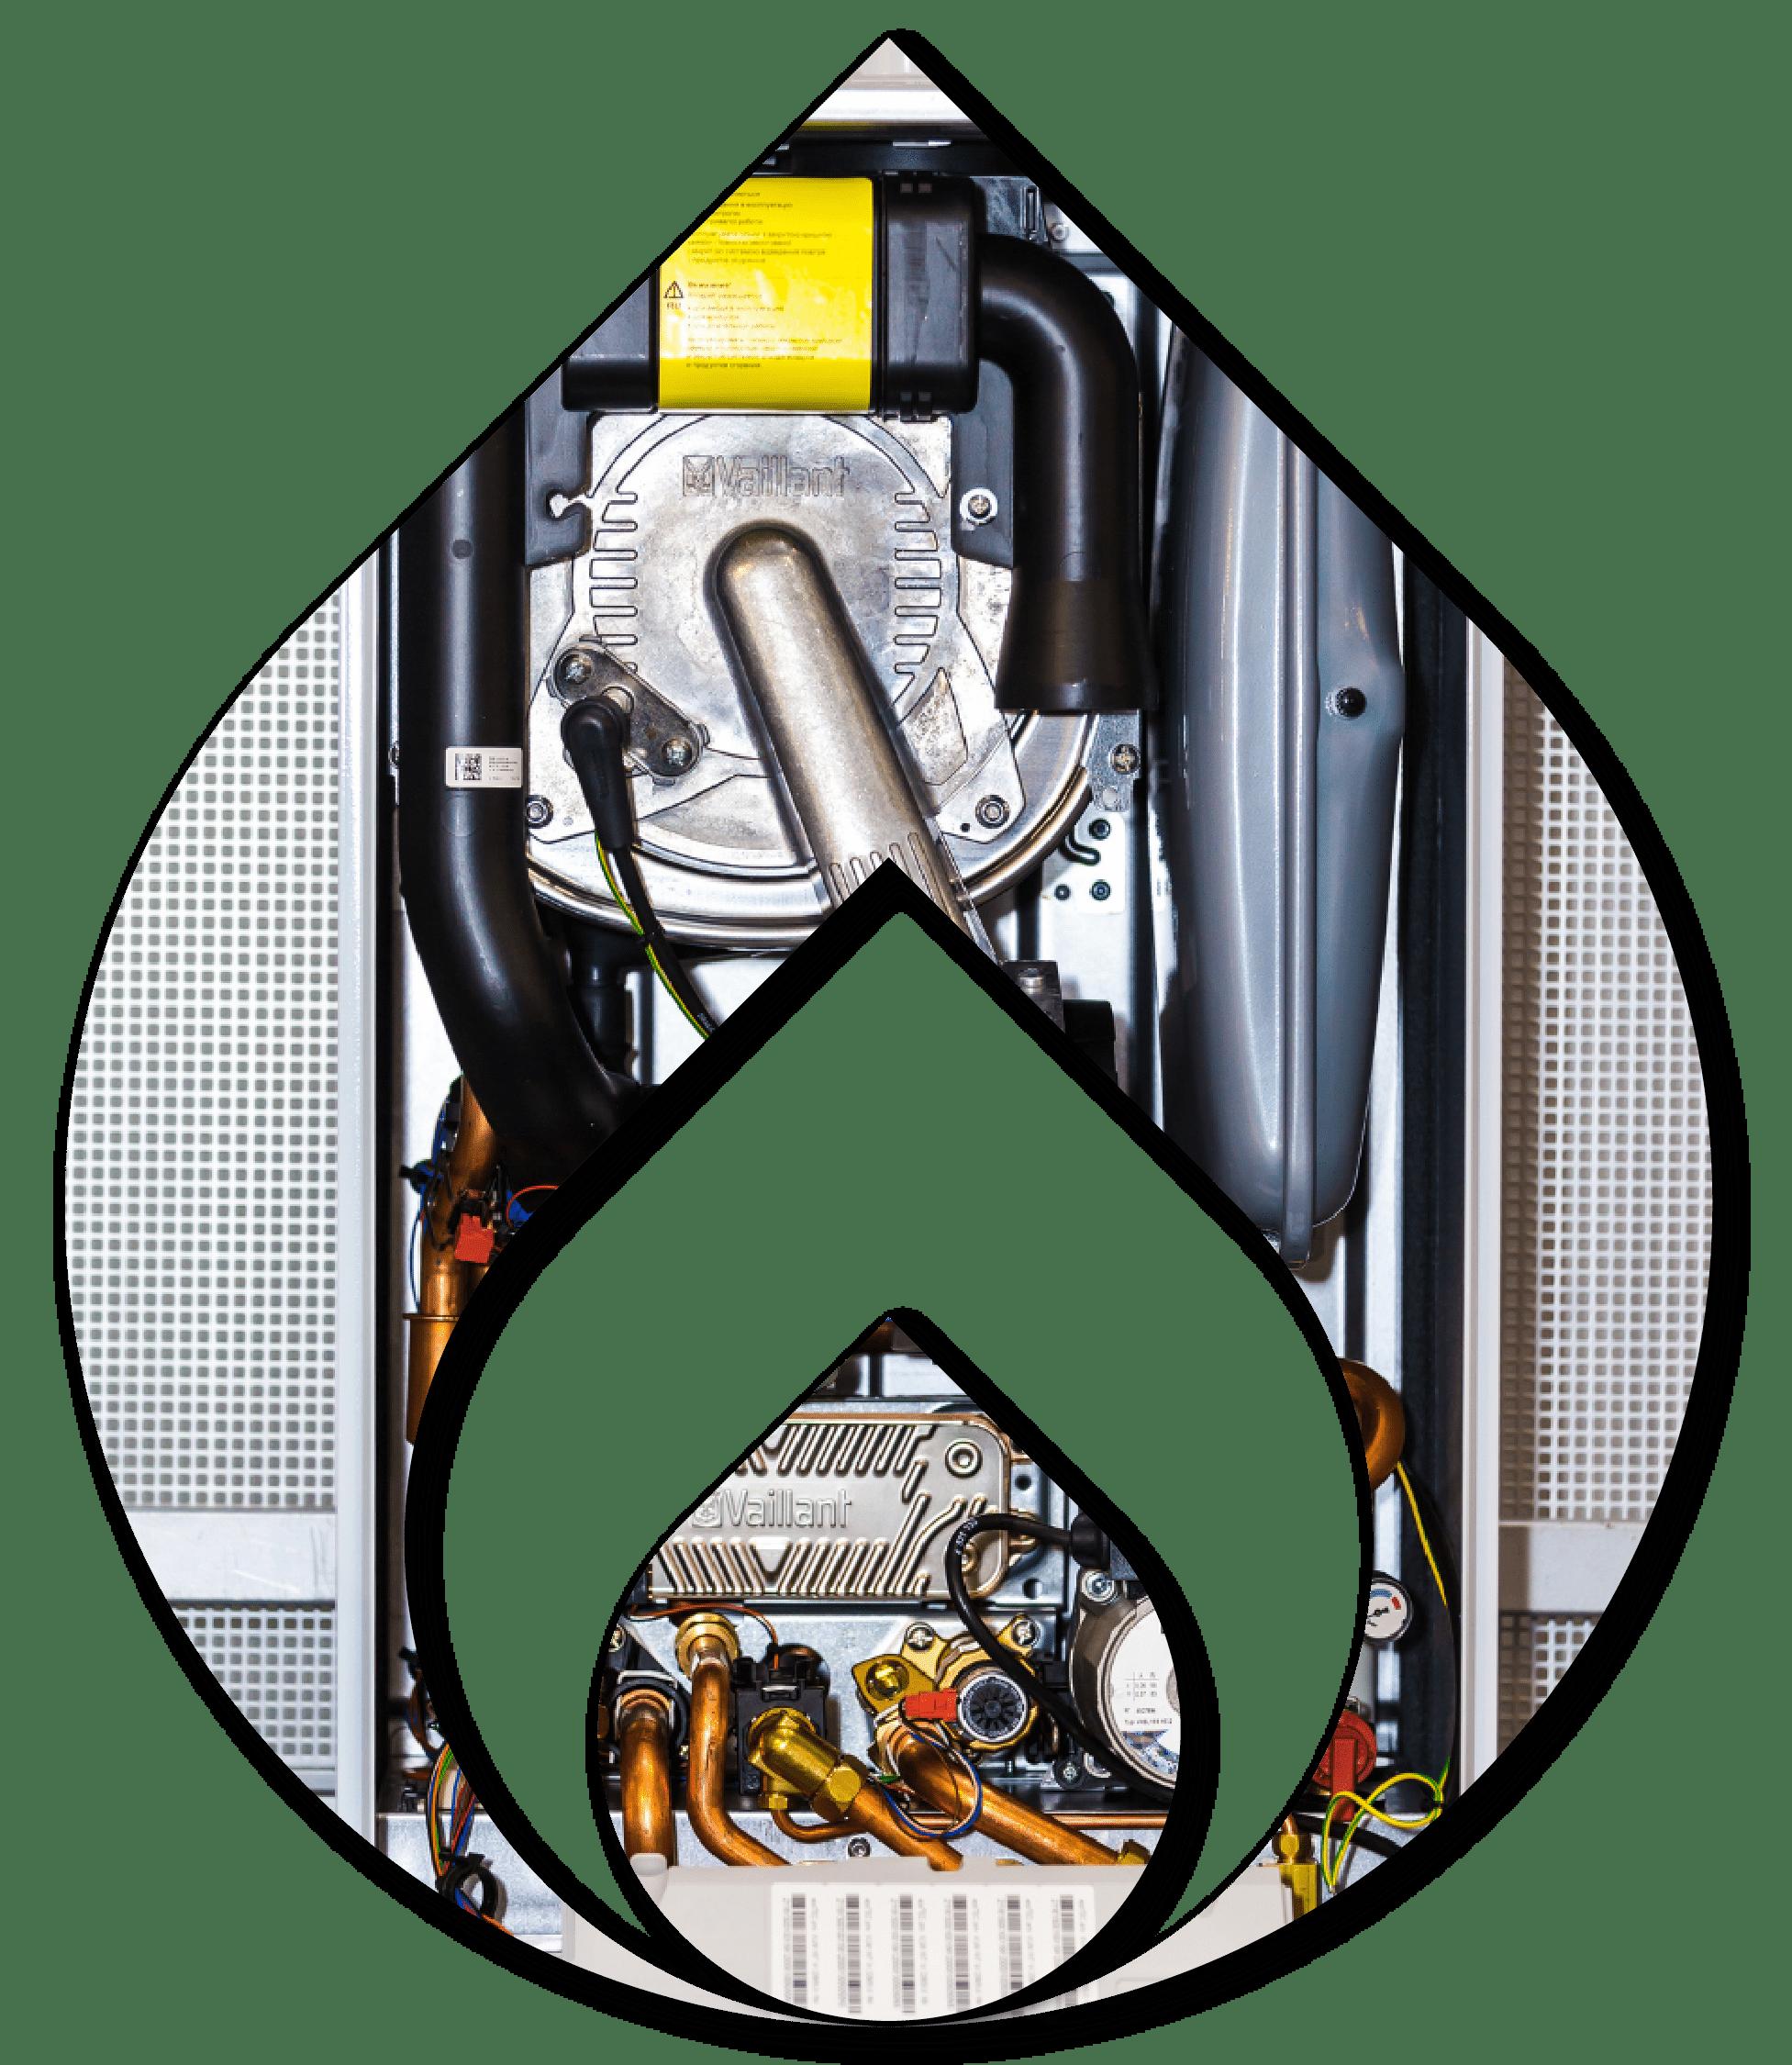 Boiler Install Burnley Blackburn Vaillant Services Vital Heating Lancashire